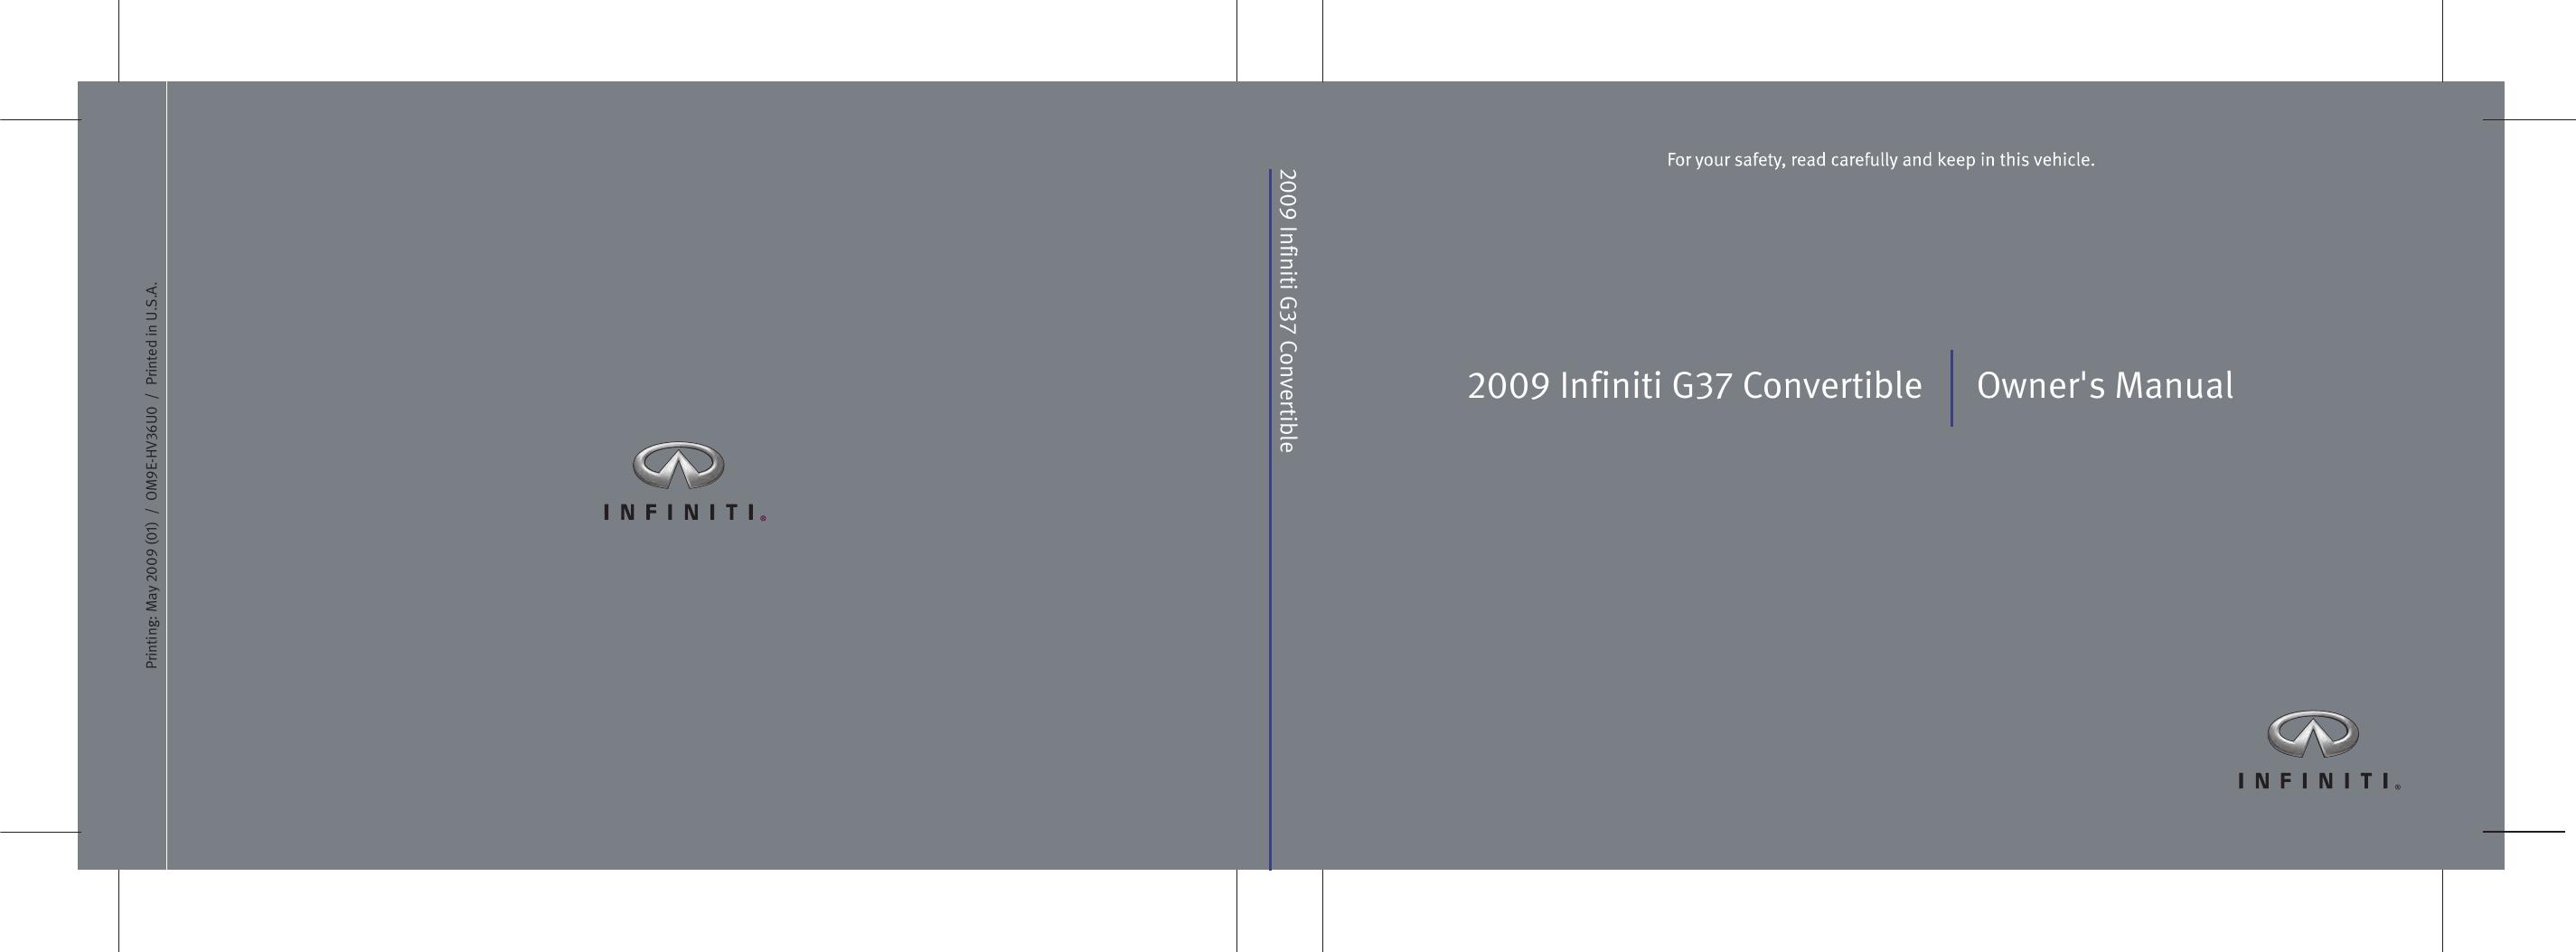 Infiniti 2009 G37 Convertible Owners Manual Owner's